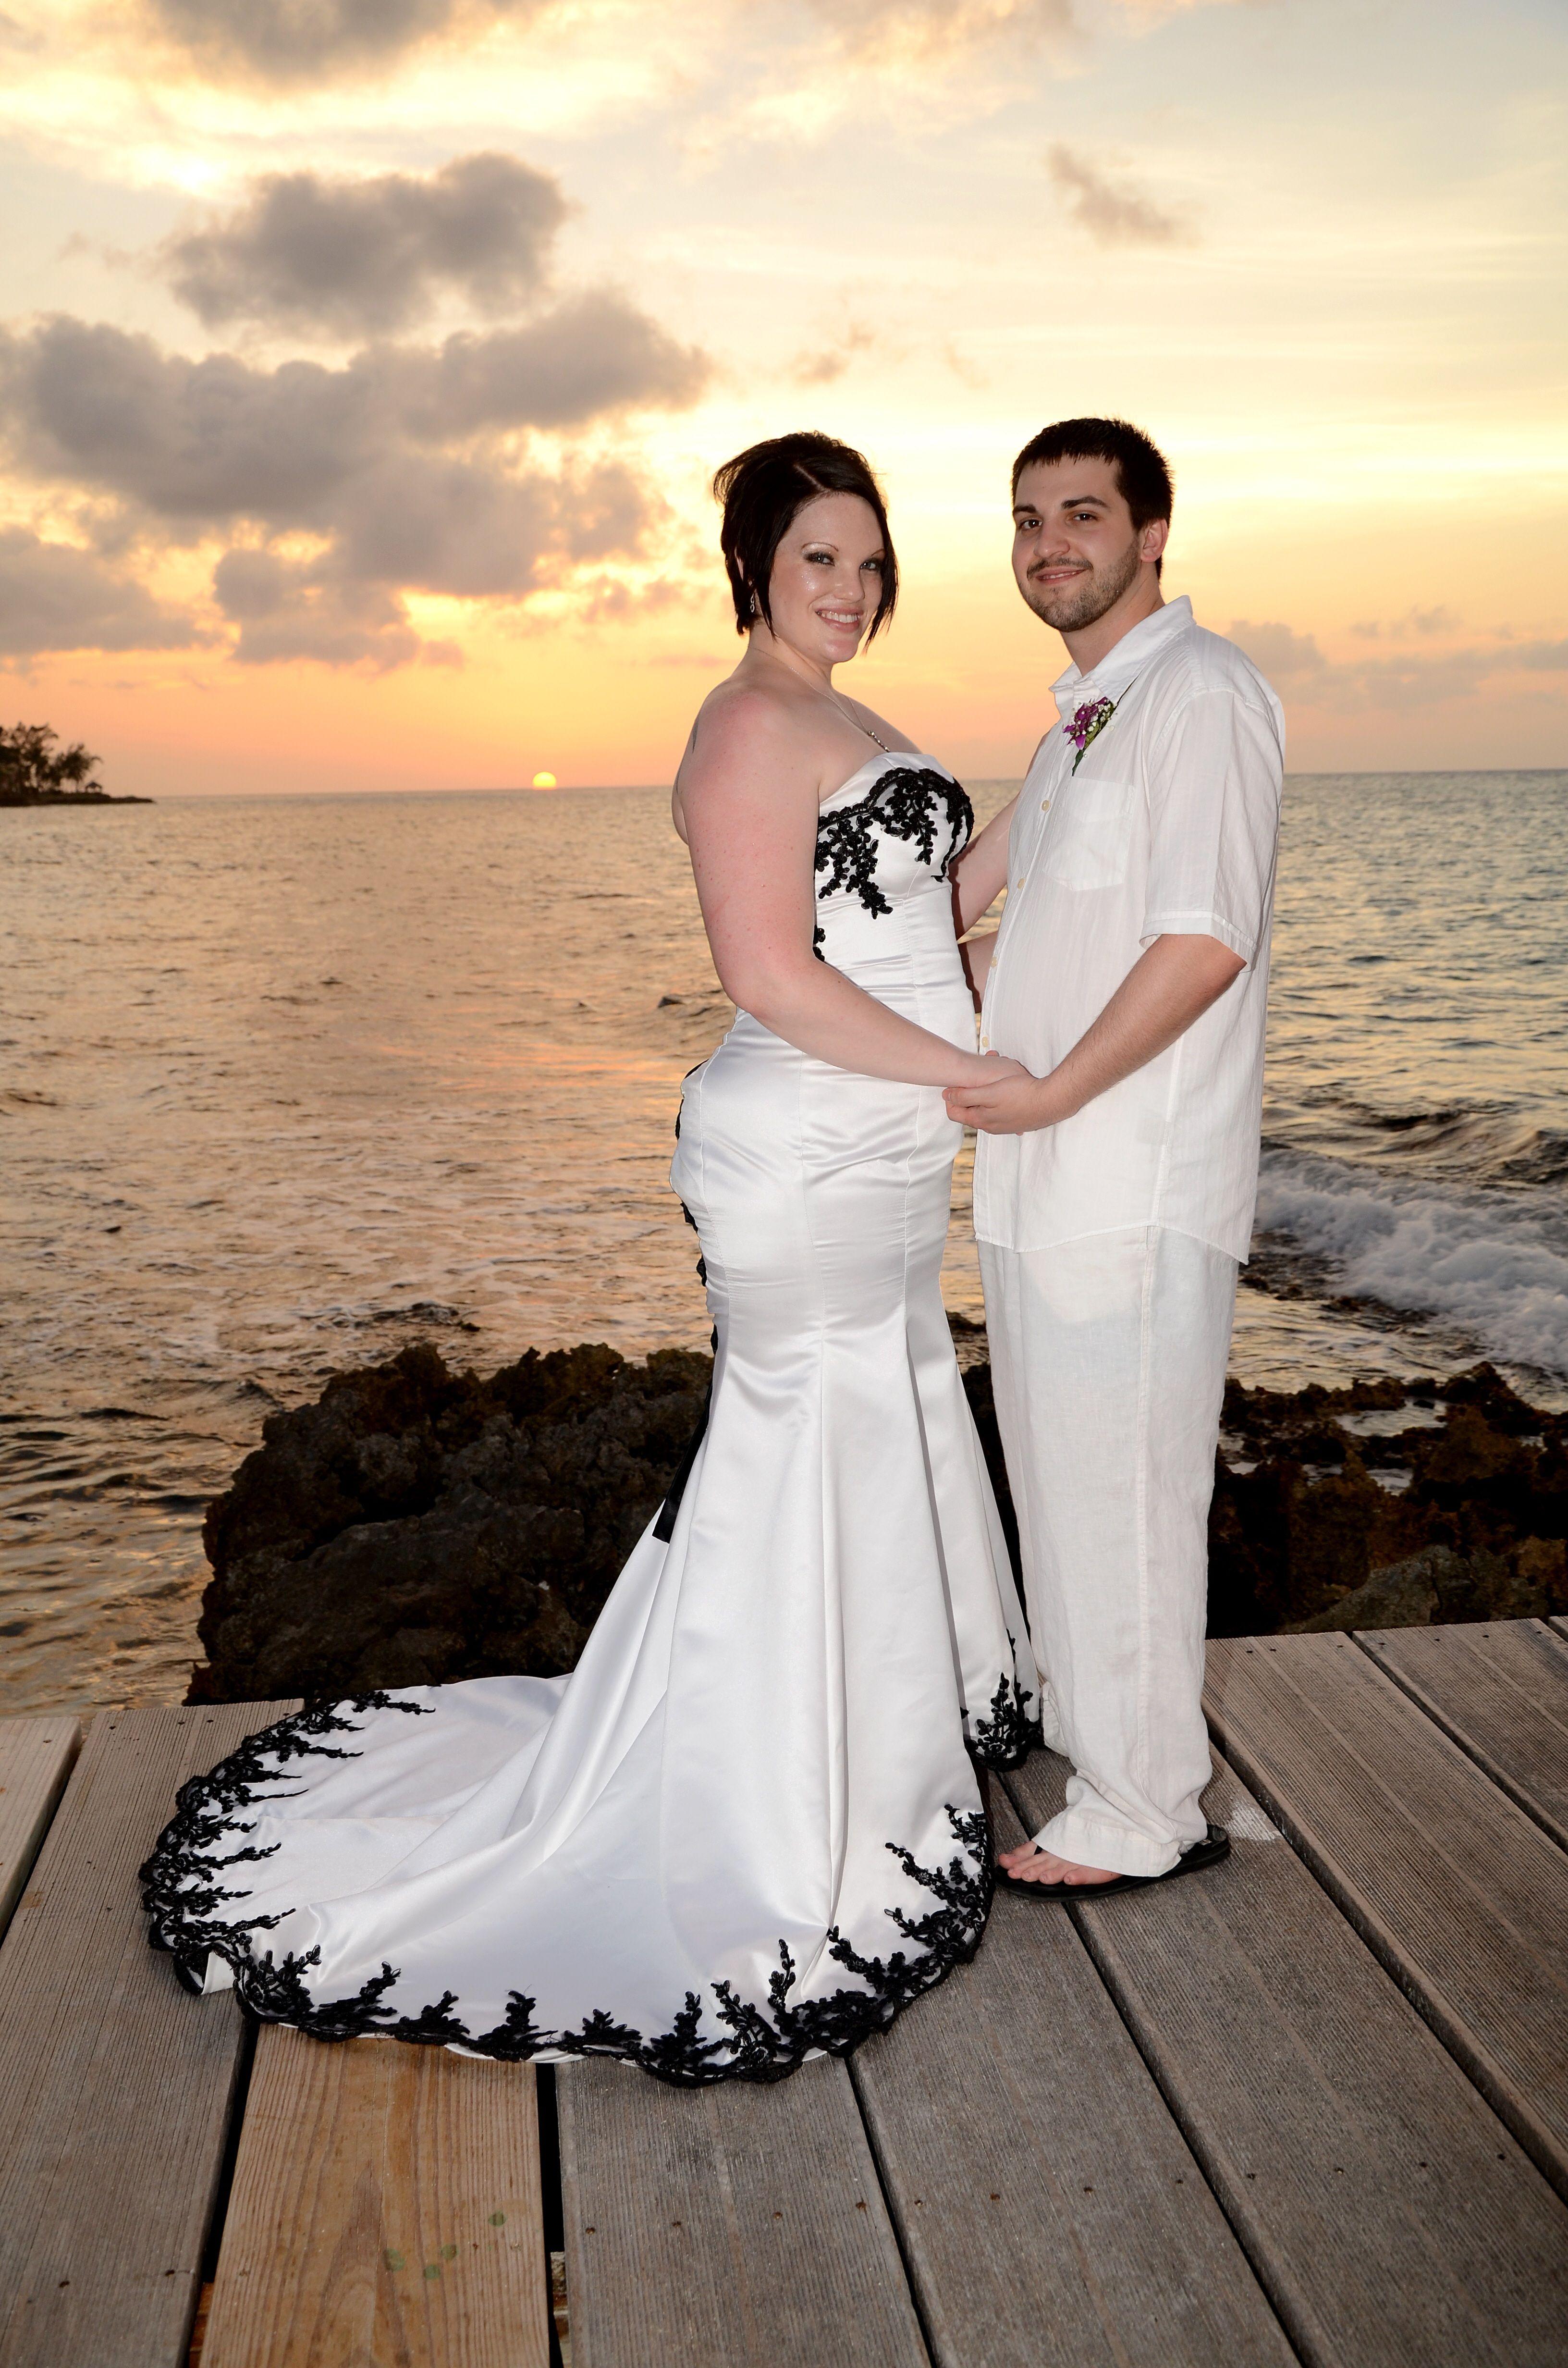 Wedding At S Tower Isle Jamaica Stowerisle Sunsetwedding Jamaicansunset